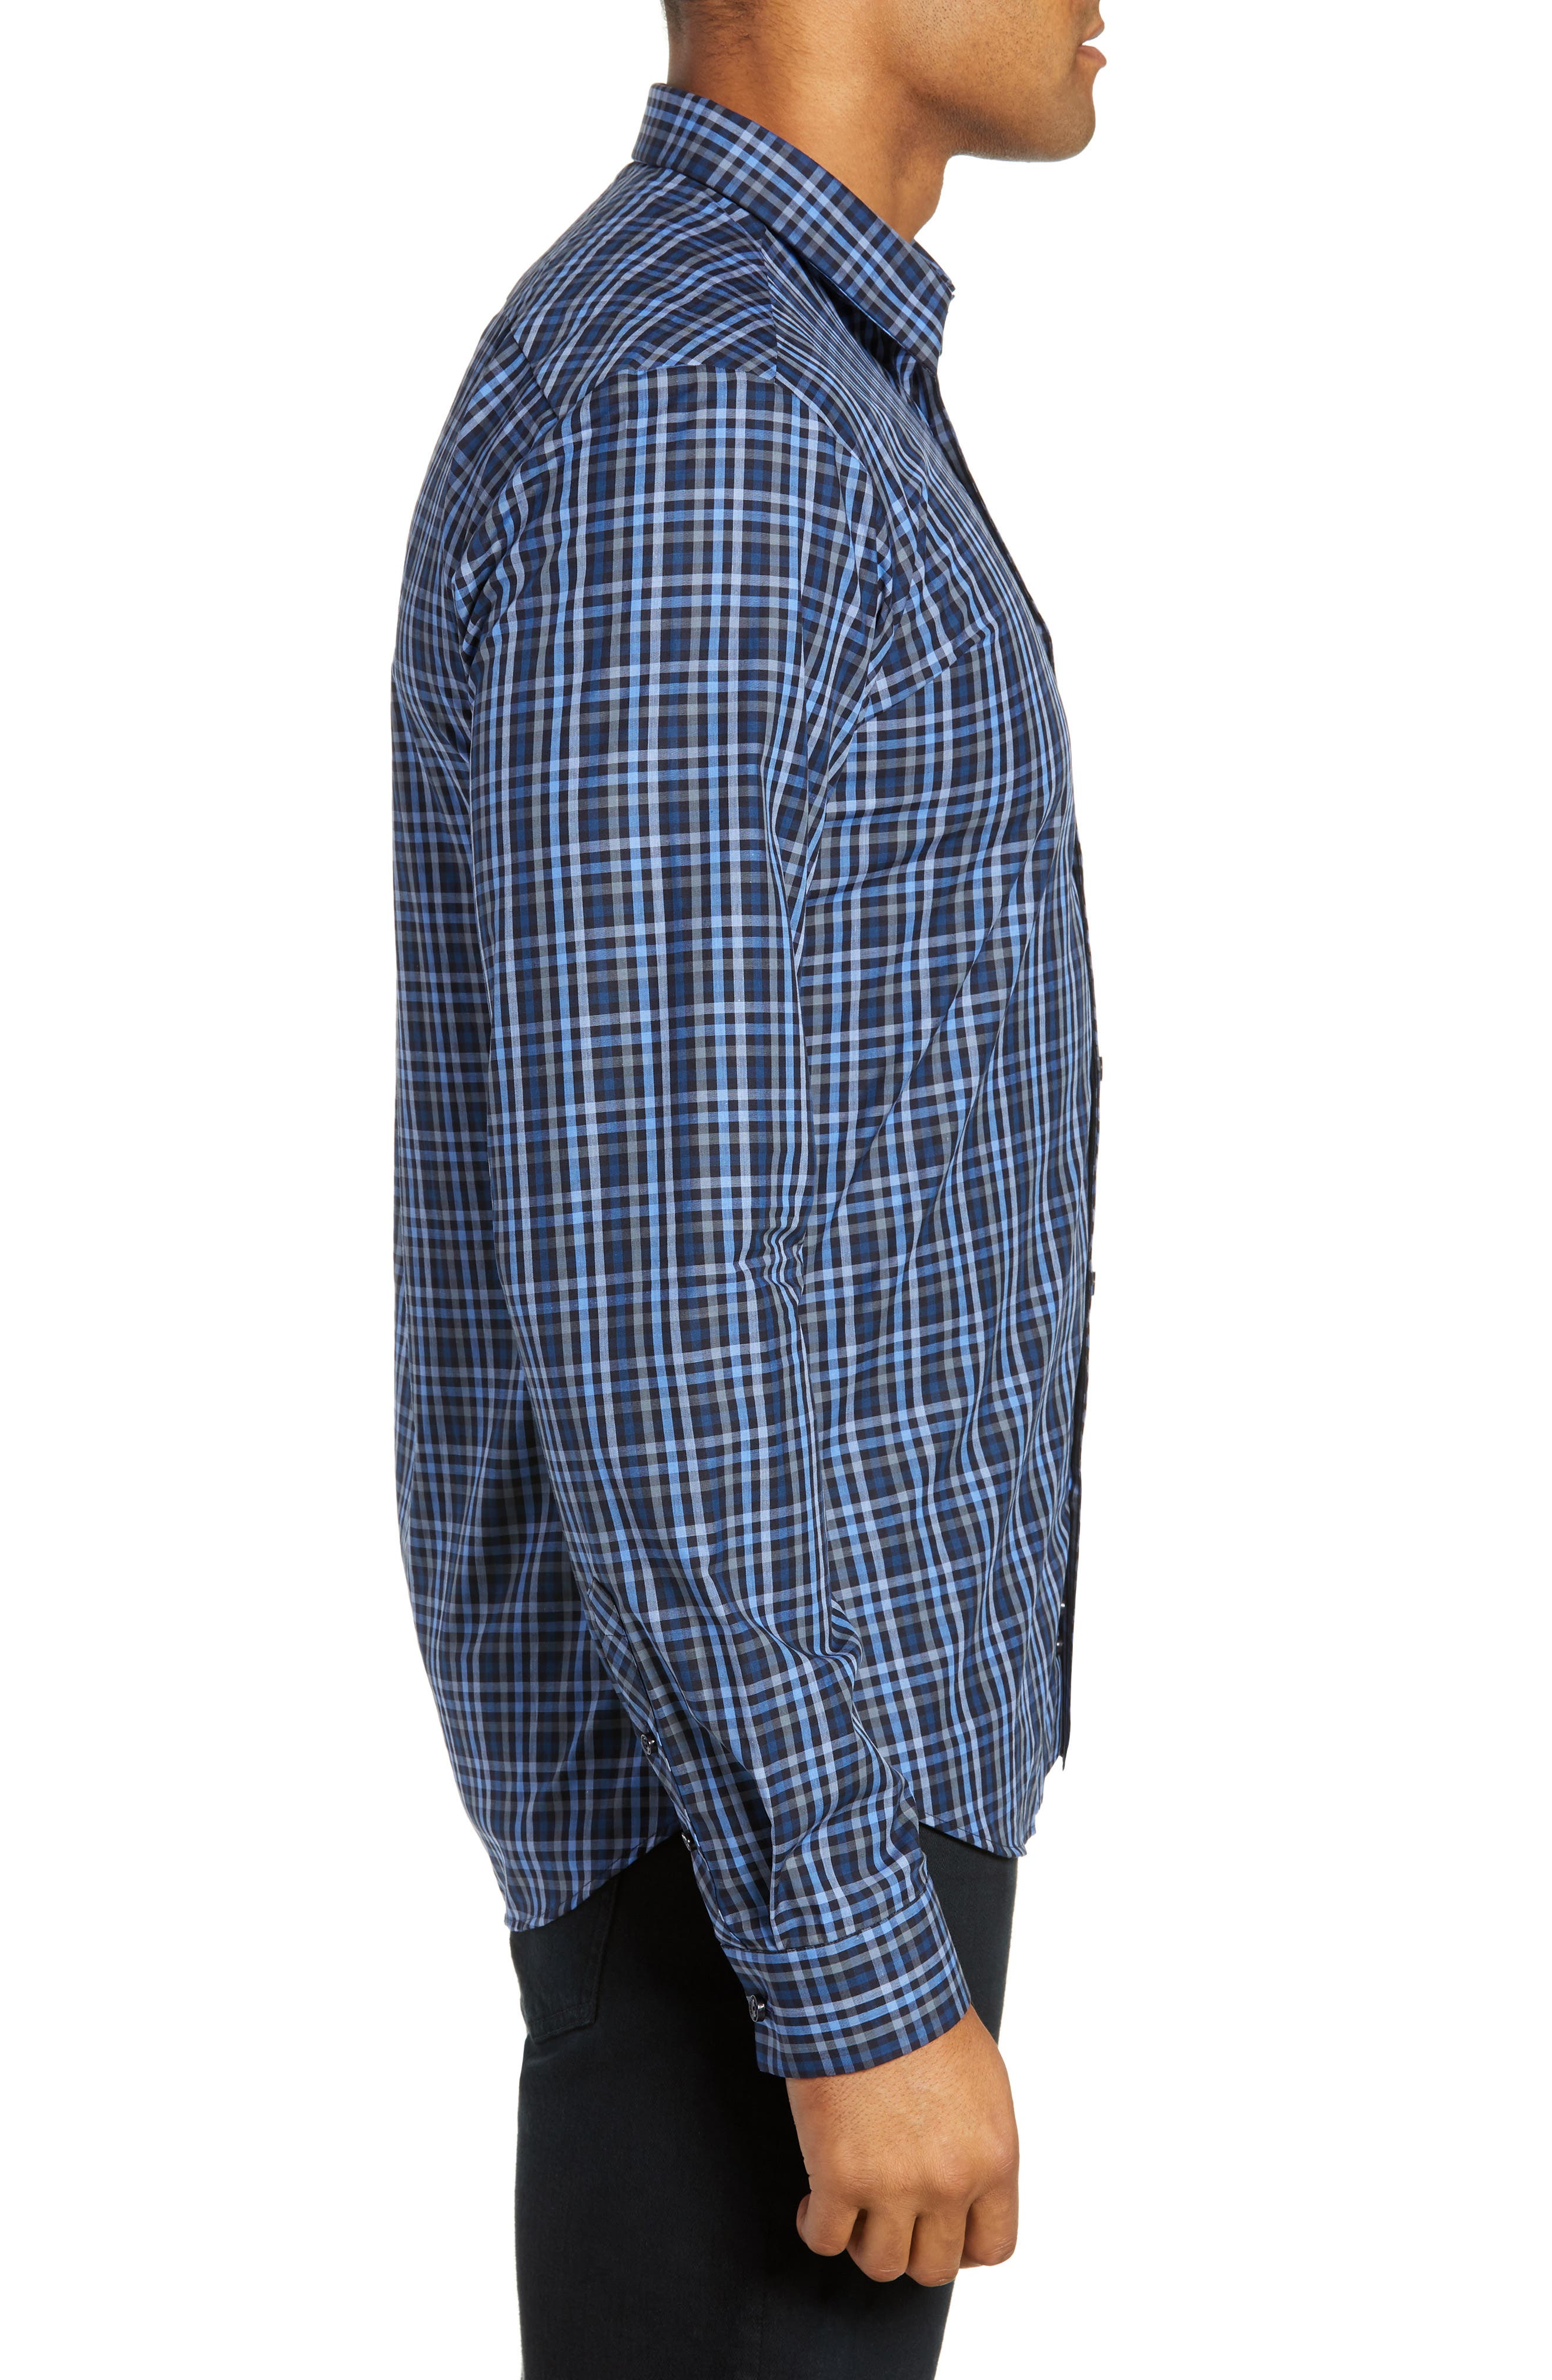 Trim Fit Sport Shirt,                             Alternate thumbnail 4, color,                             NAVY - BLUE MULTI CHECK